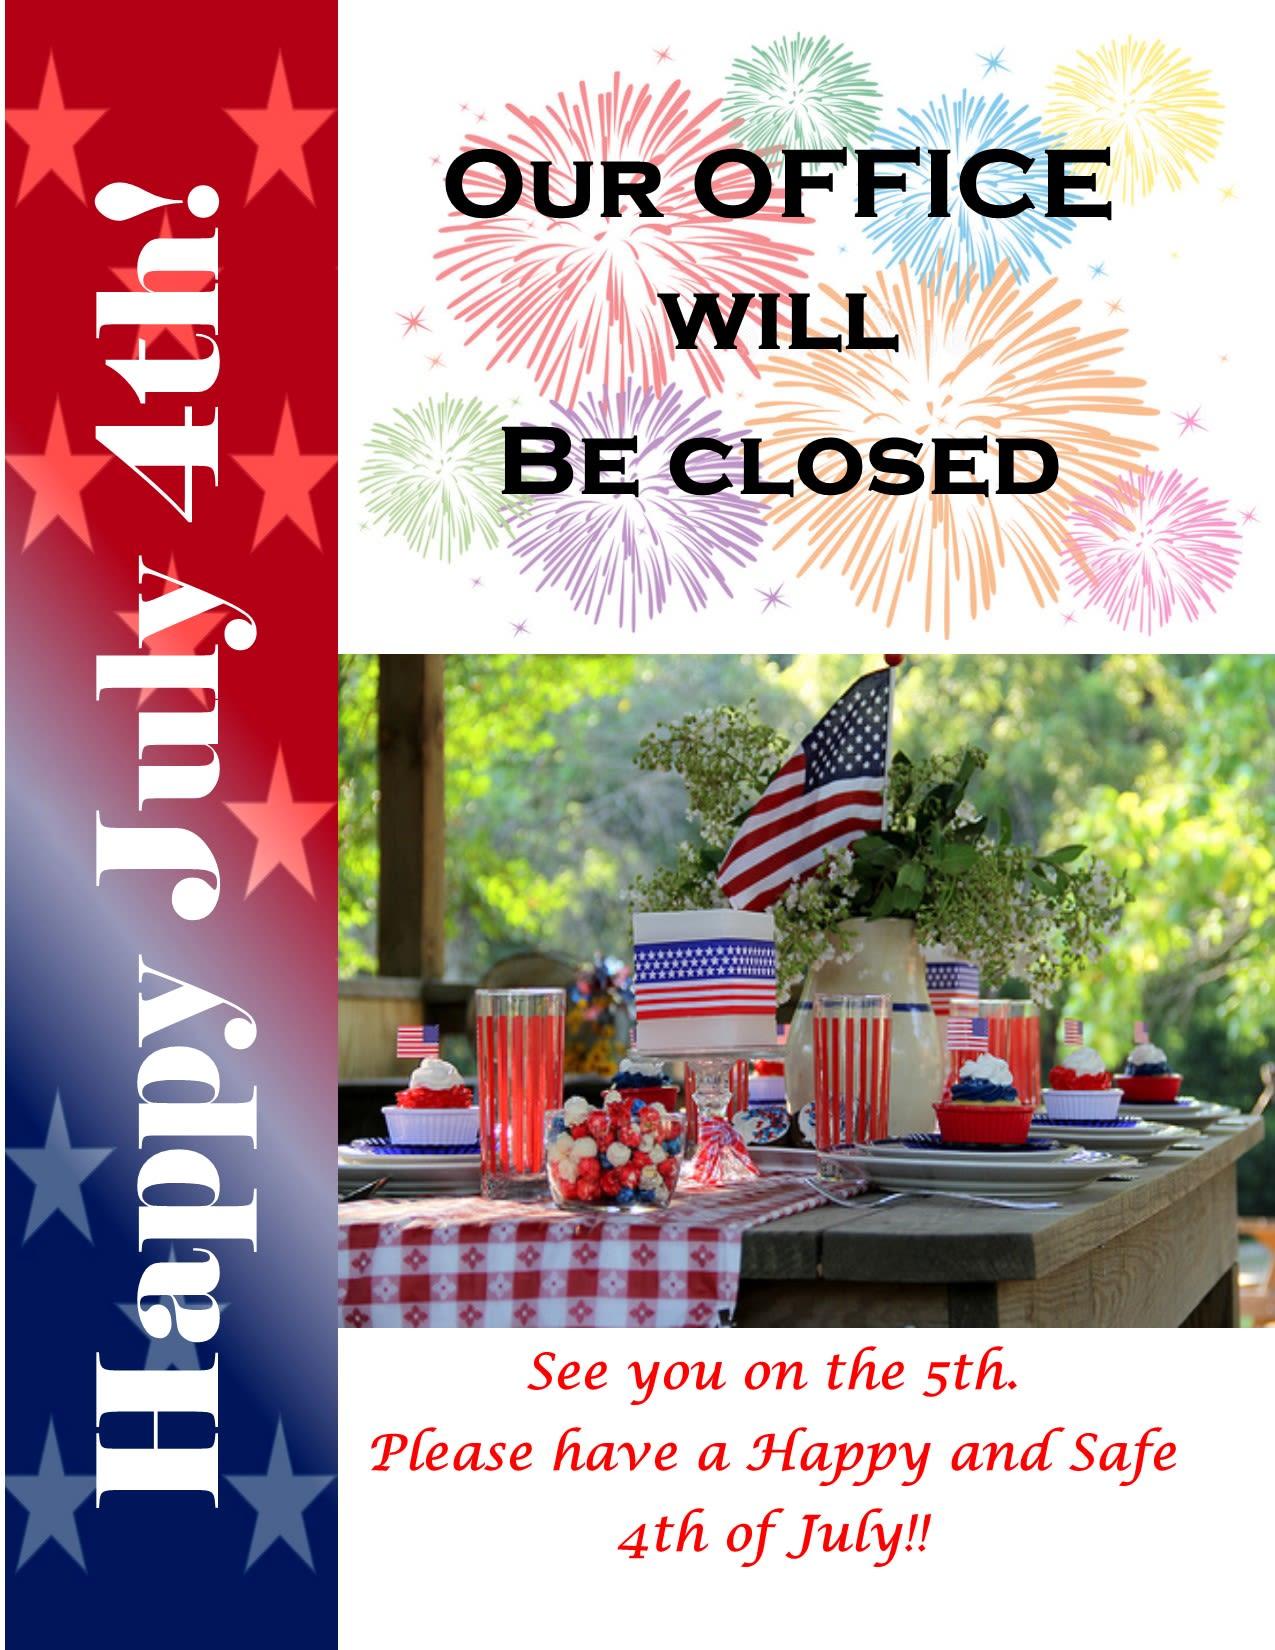 4th of July Closing